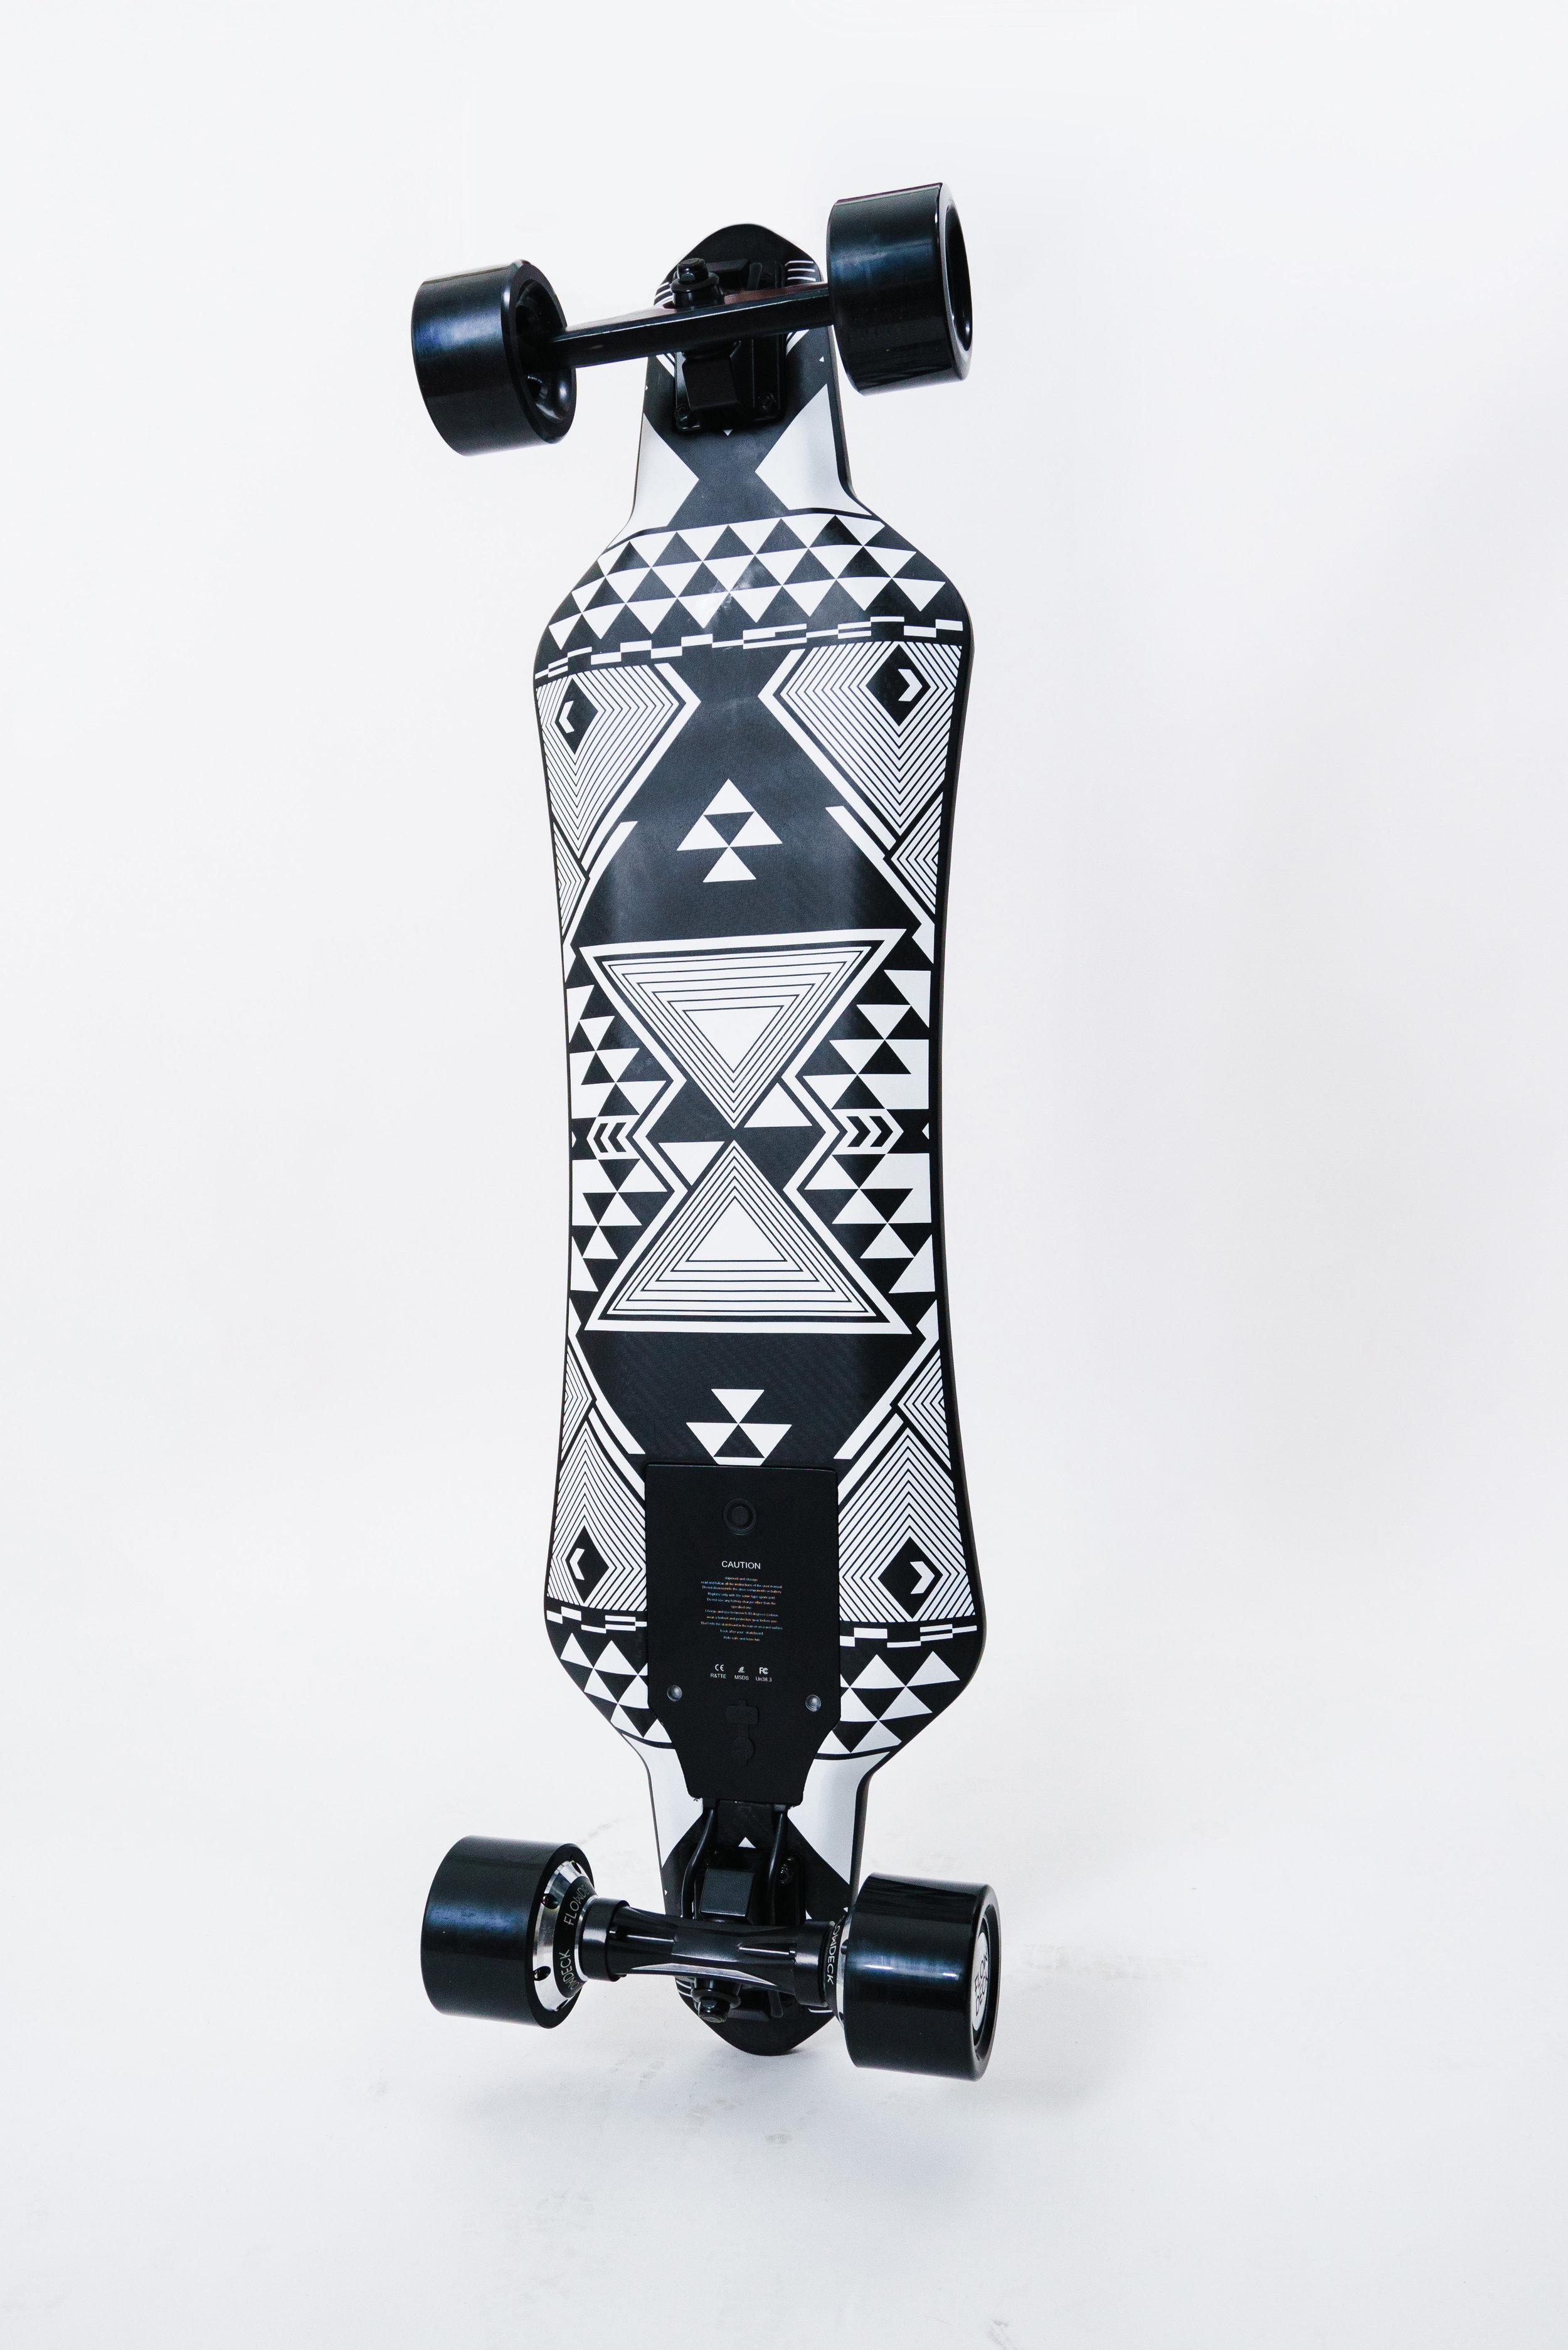 Flowdeck X skateboard électrique motorisé